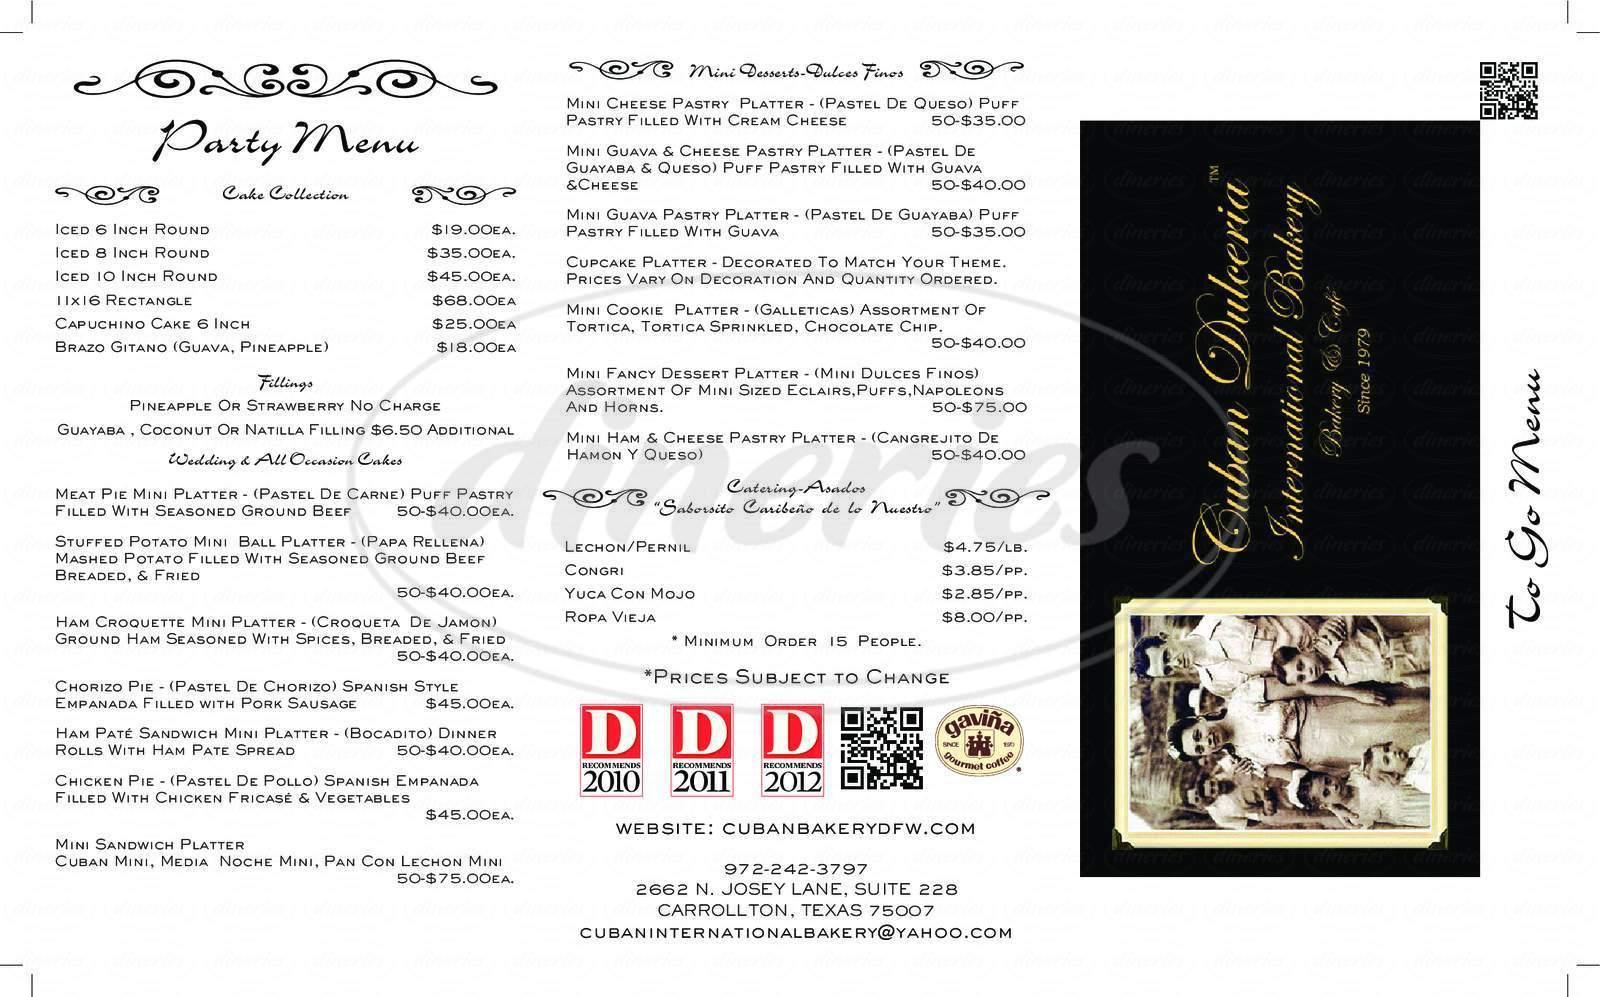 menu for International Bakery